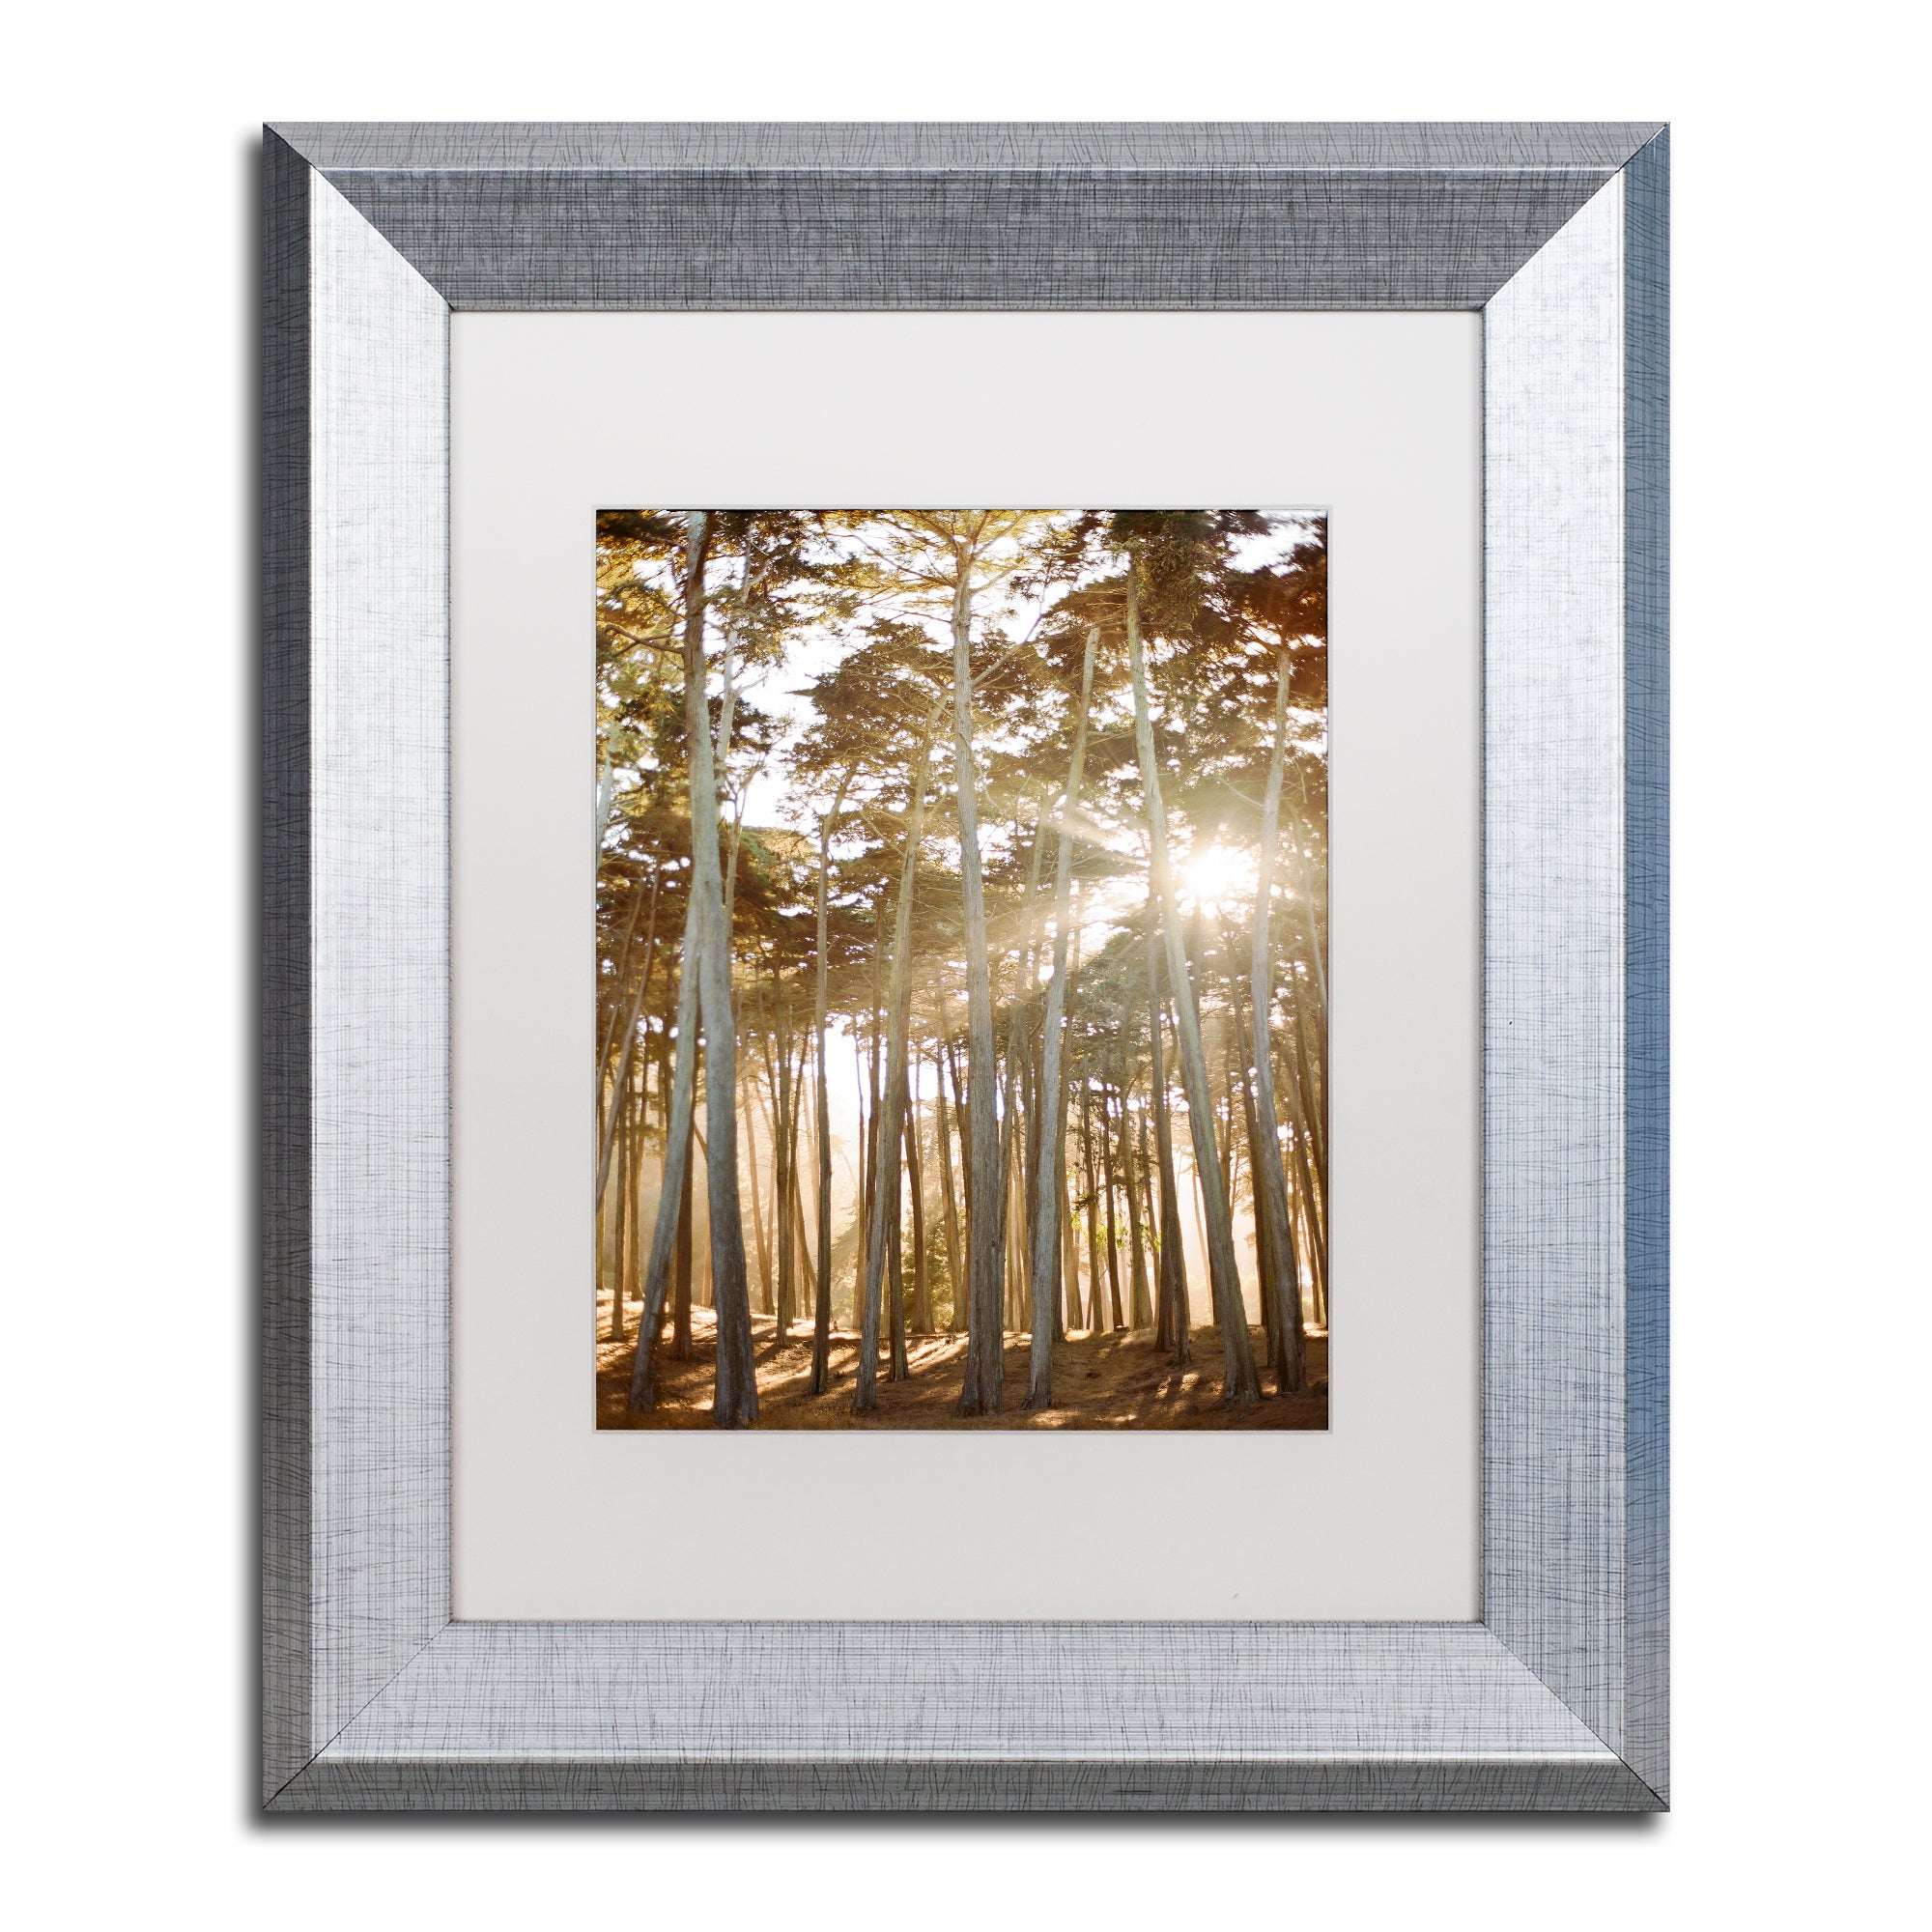 Ariane Moshayedi Presidio Sunset Trees Matted Framed Art Overstock 12390805